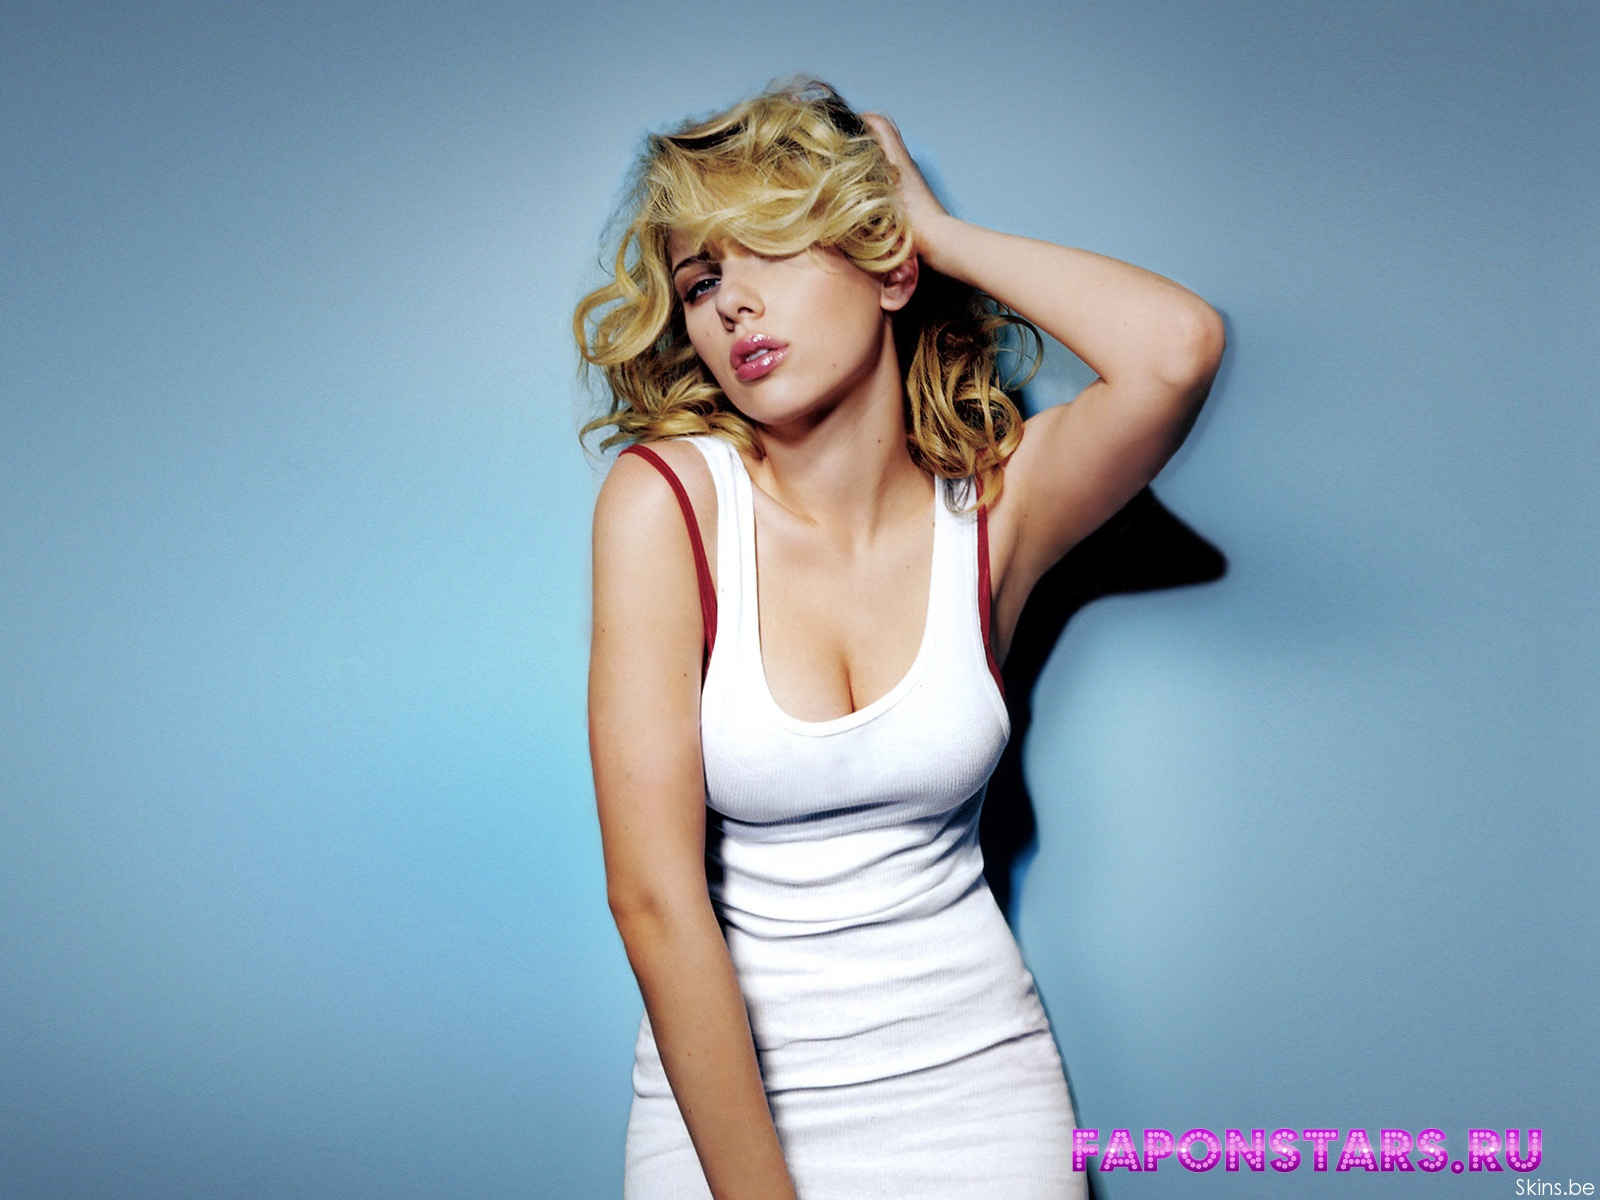 Scarlett Johansson / Скарлетт Йоханссон обнаженная фото